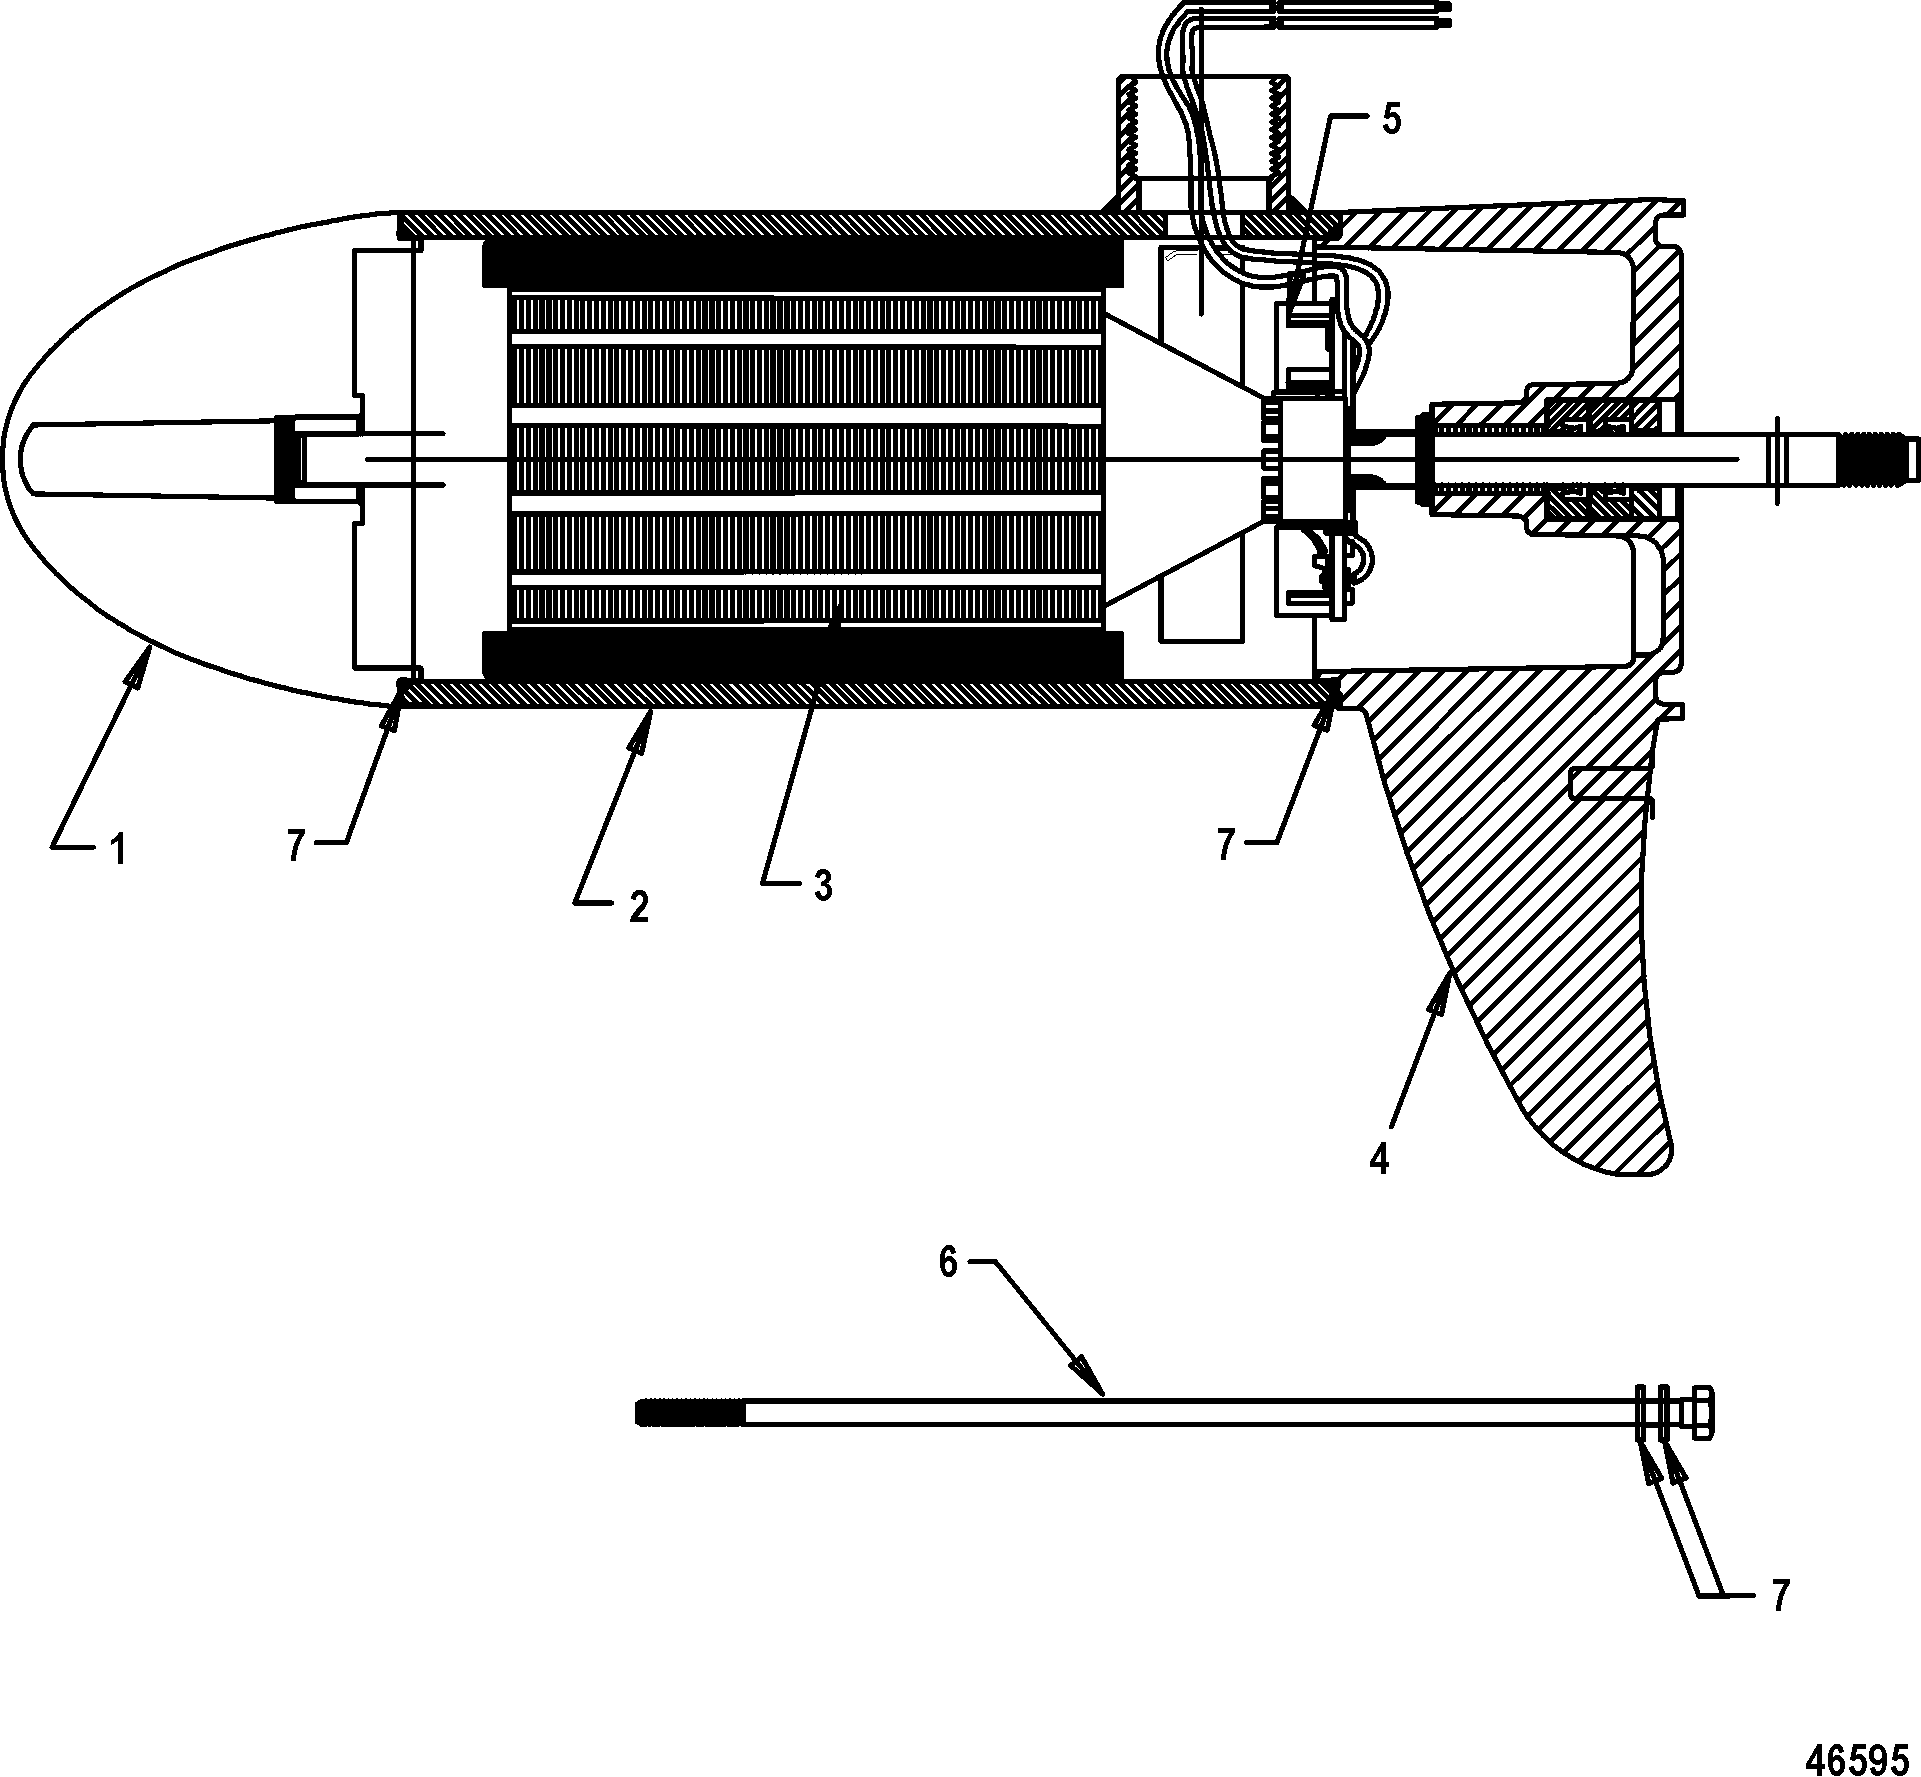 Motorguide Pro Series Parts Diagram